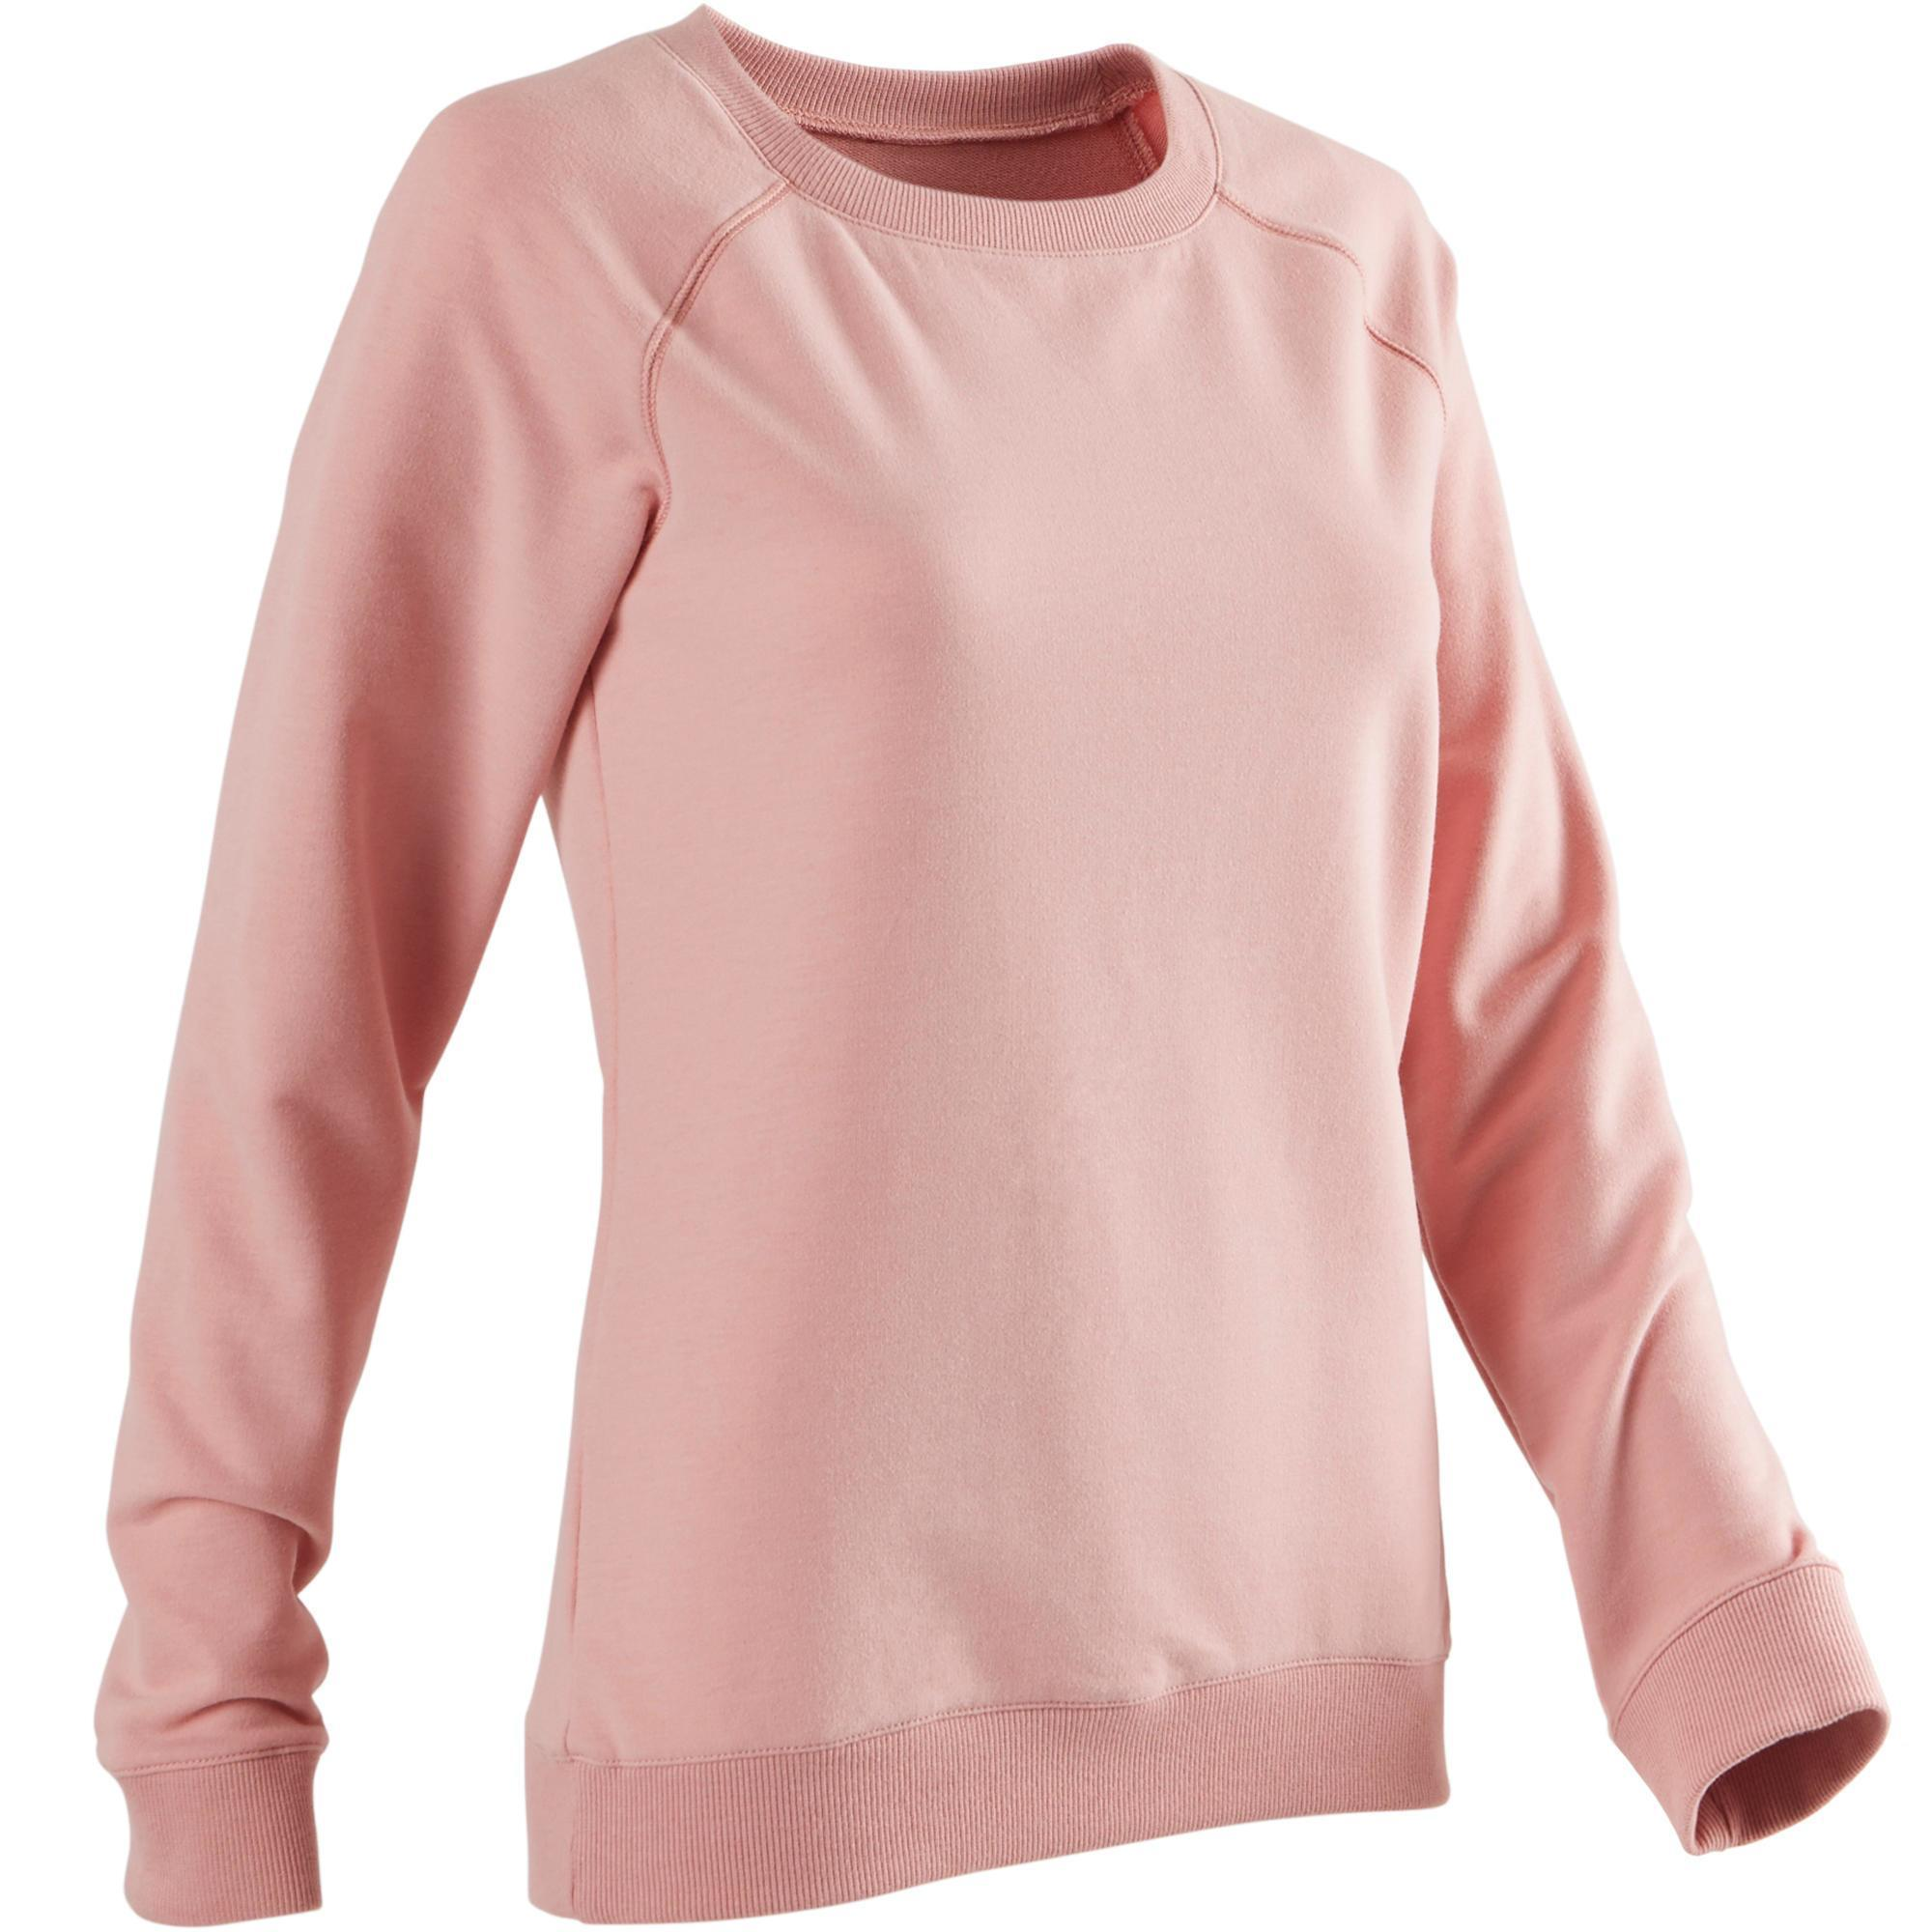 Domyos Damessweater voor pilates of lichte gym 500 roze